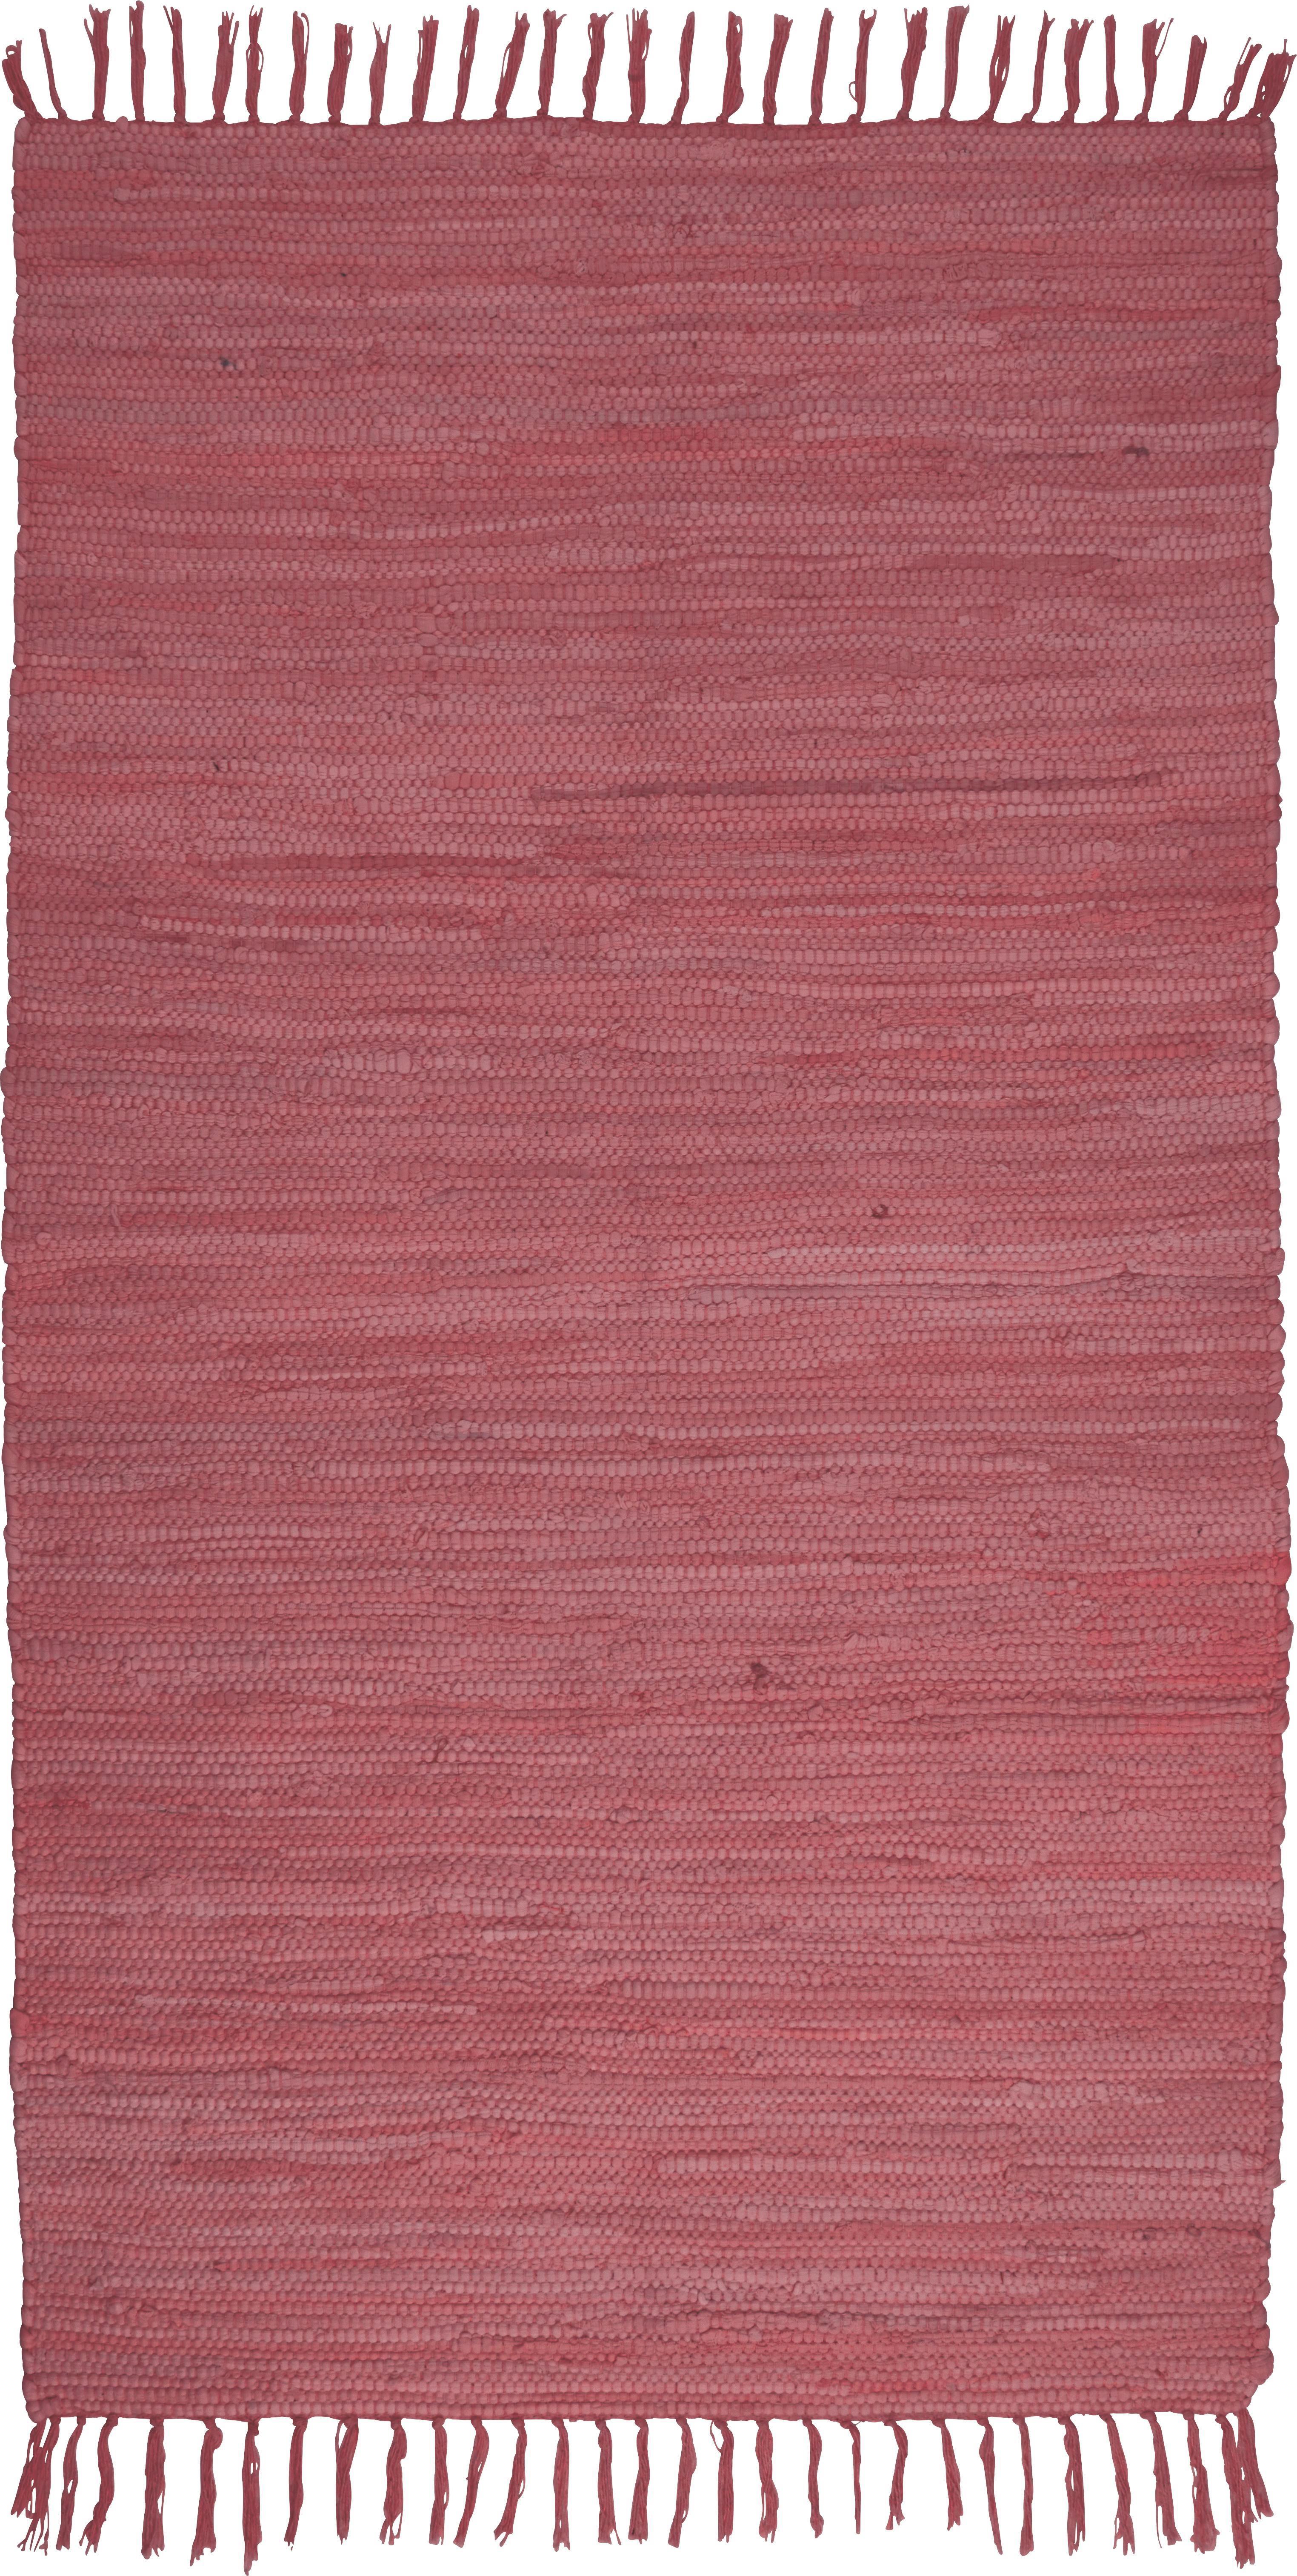 Fleckerlteppich Julia in Rot, ca. 70x130cm - Rot, Textil (70/130cm) - MÖMAX modern living